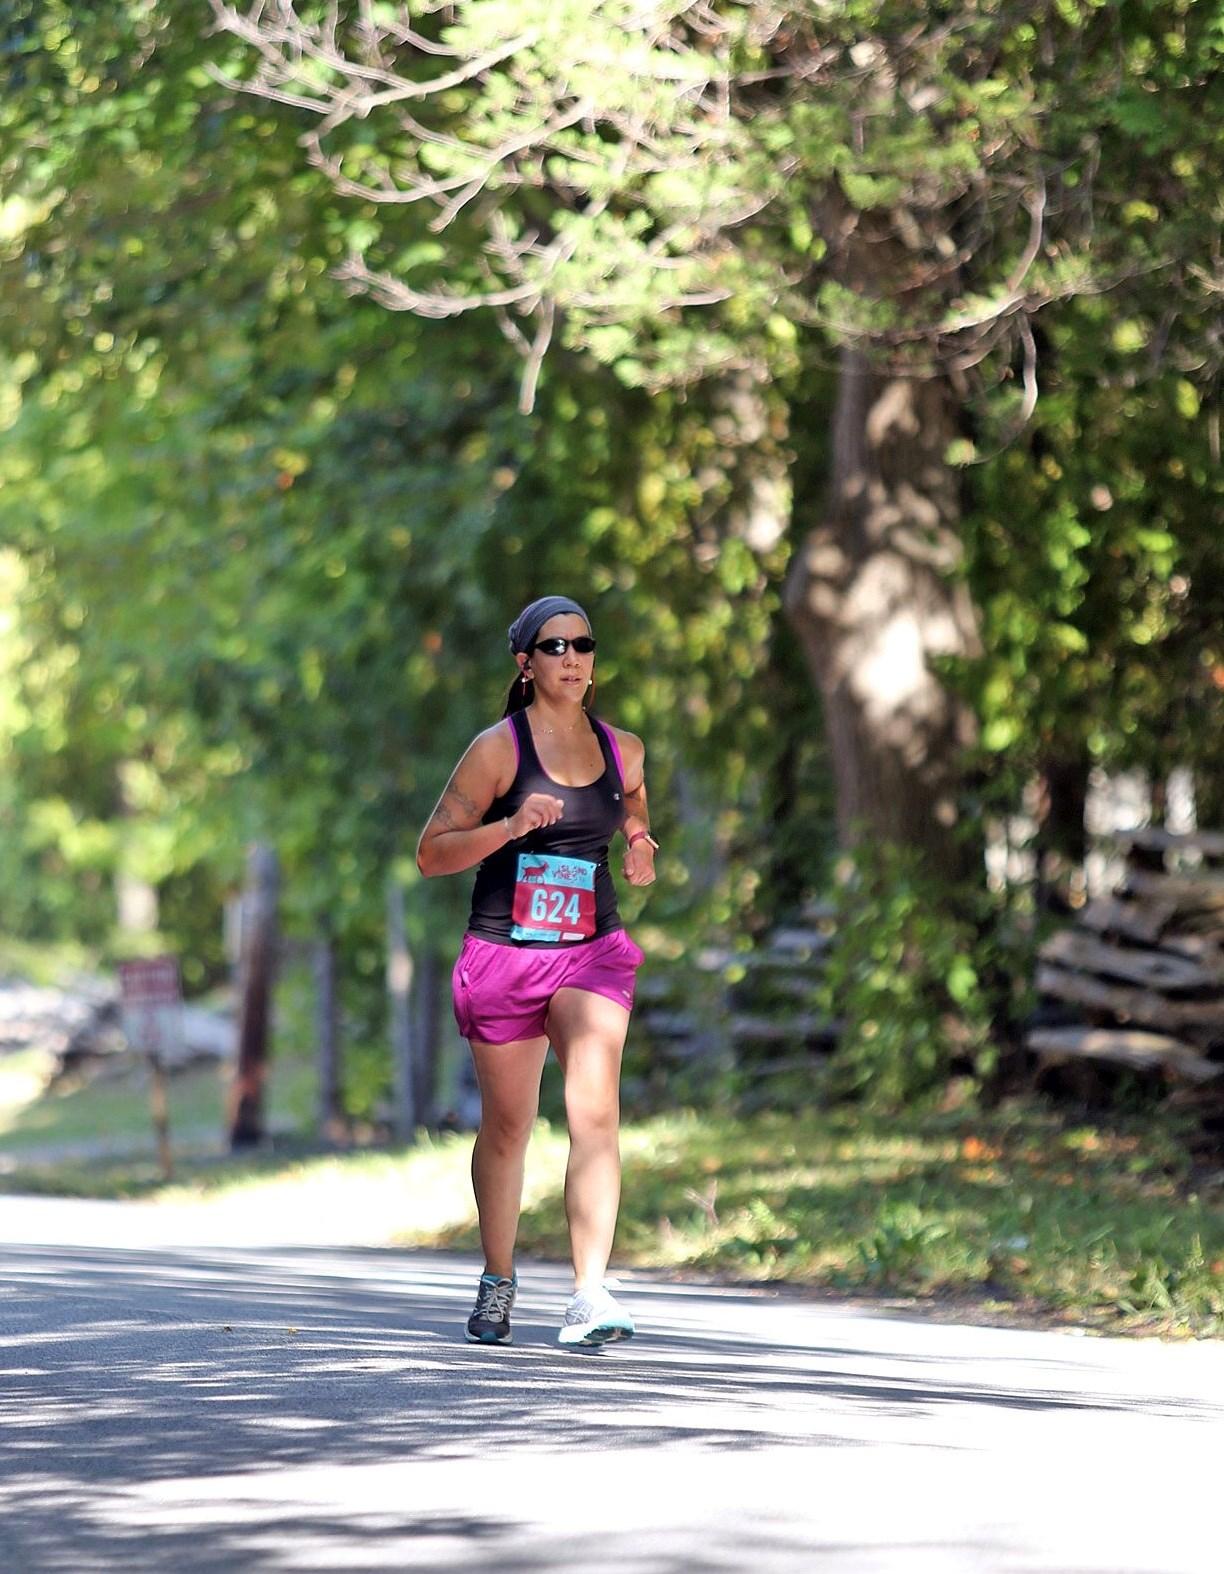 Kyla's Second Marathon for Time Goal